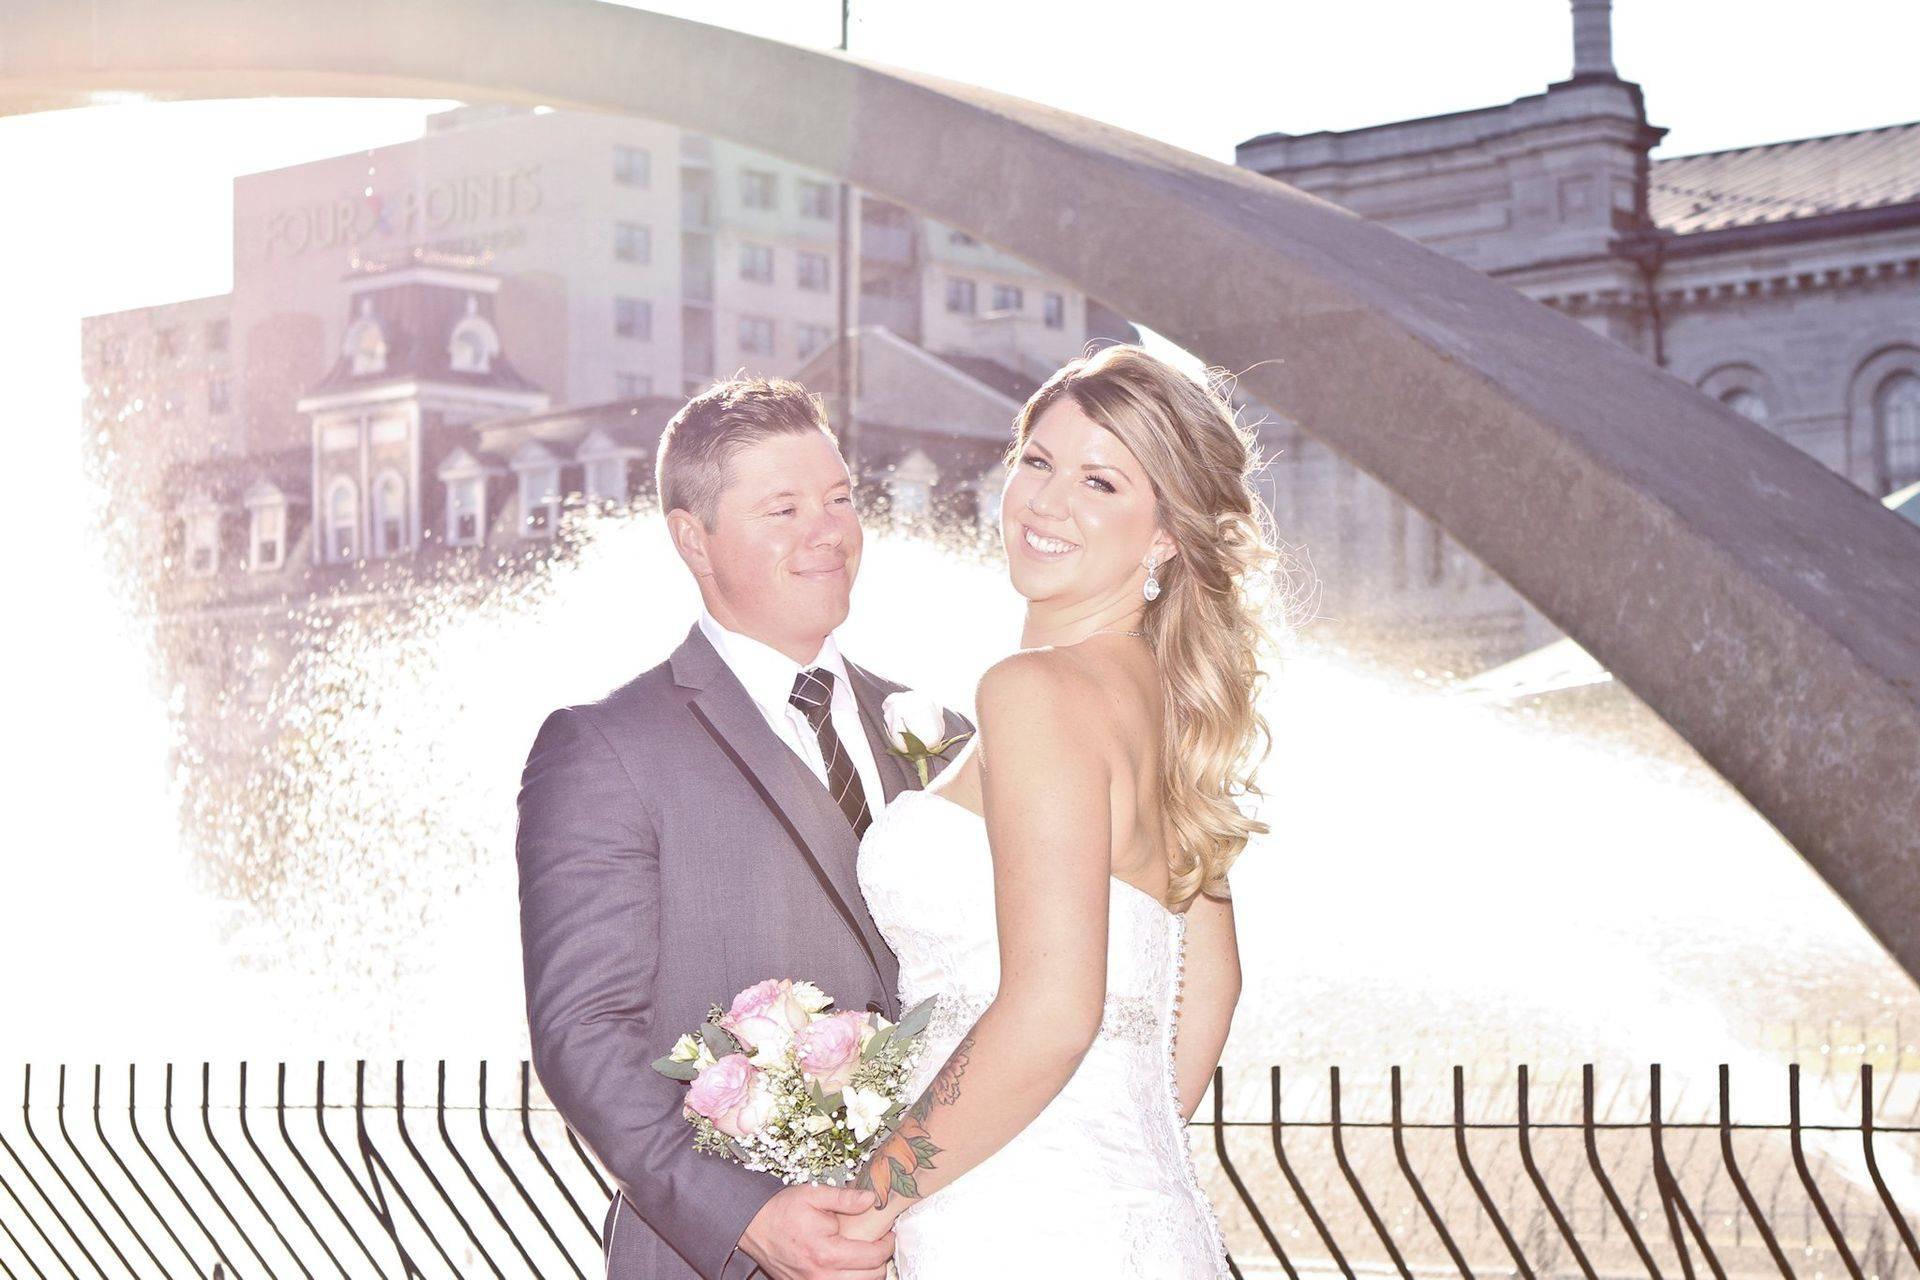 Brockville wedding photographer, kingston wedding photographer, cornwall wedding photographer, ottawa wedding photographer, gananoque wedding photographer, vertigo productions photography